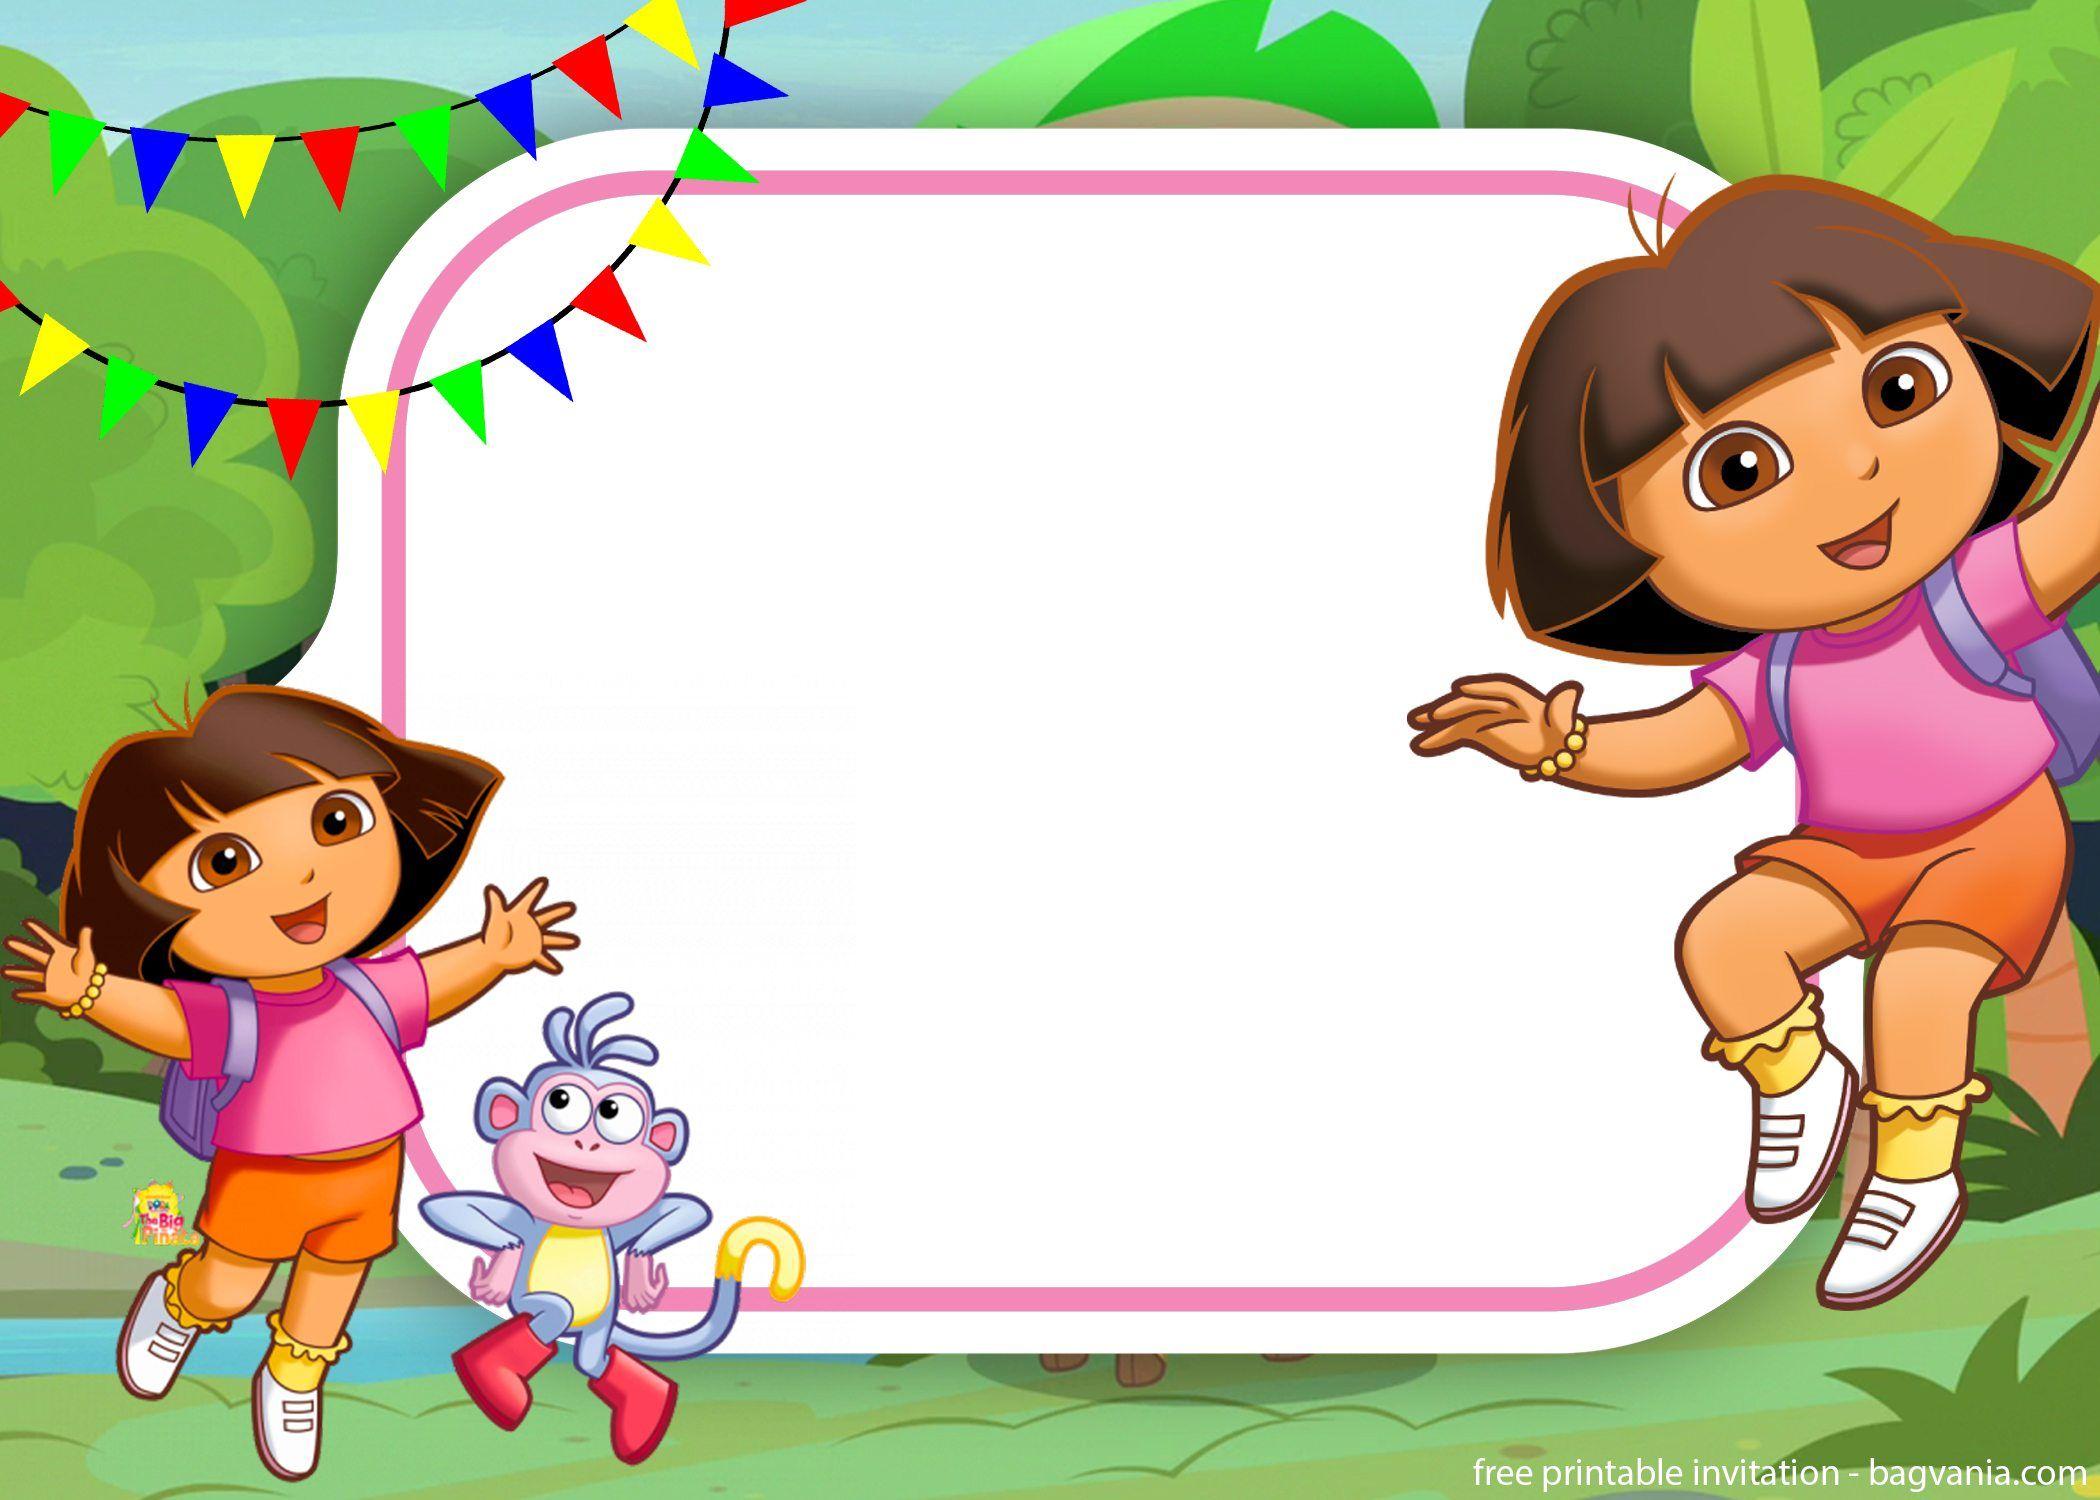 Free Dora The Explorer Invitation For Your Little Explorers Explorer Birthday Party Birthday Invitations Kids Explorer Invitation